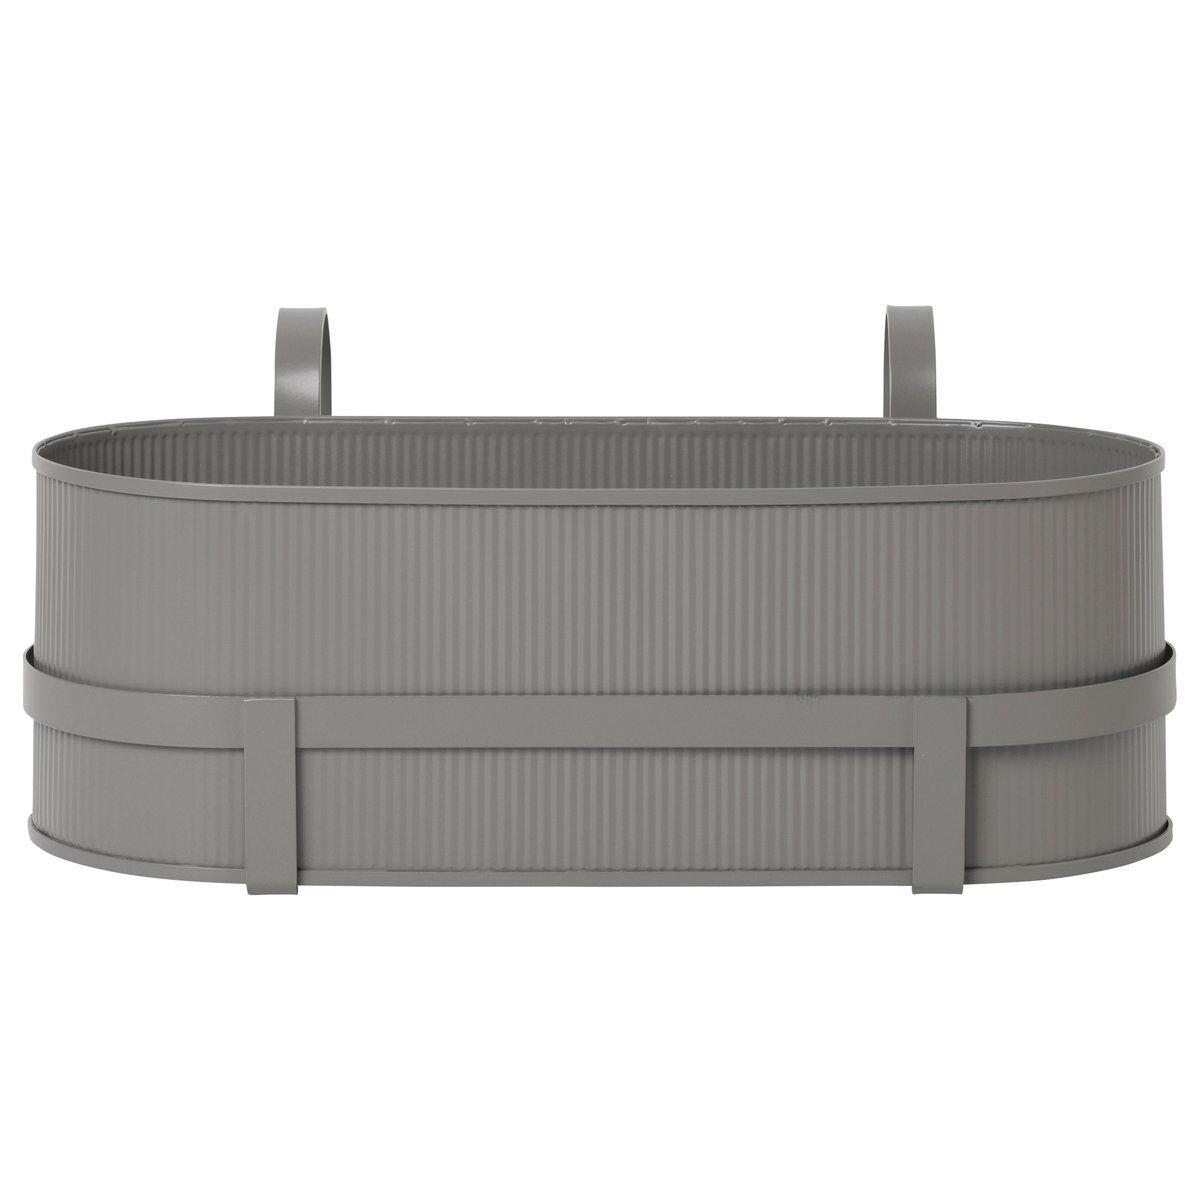 Ferm Living Bau balkongkasse Warm grey